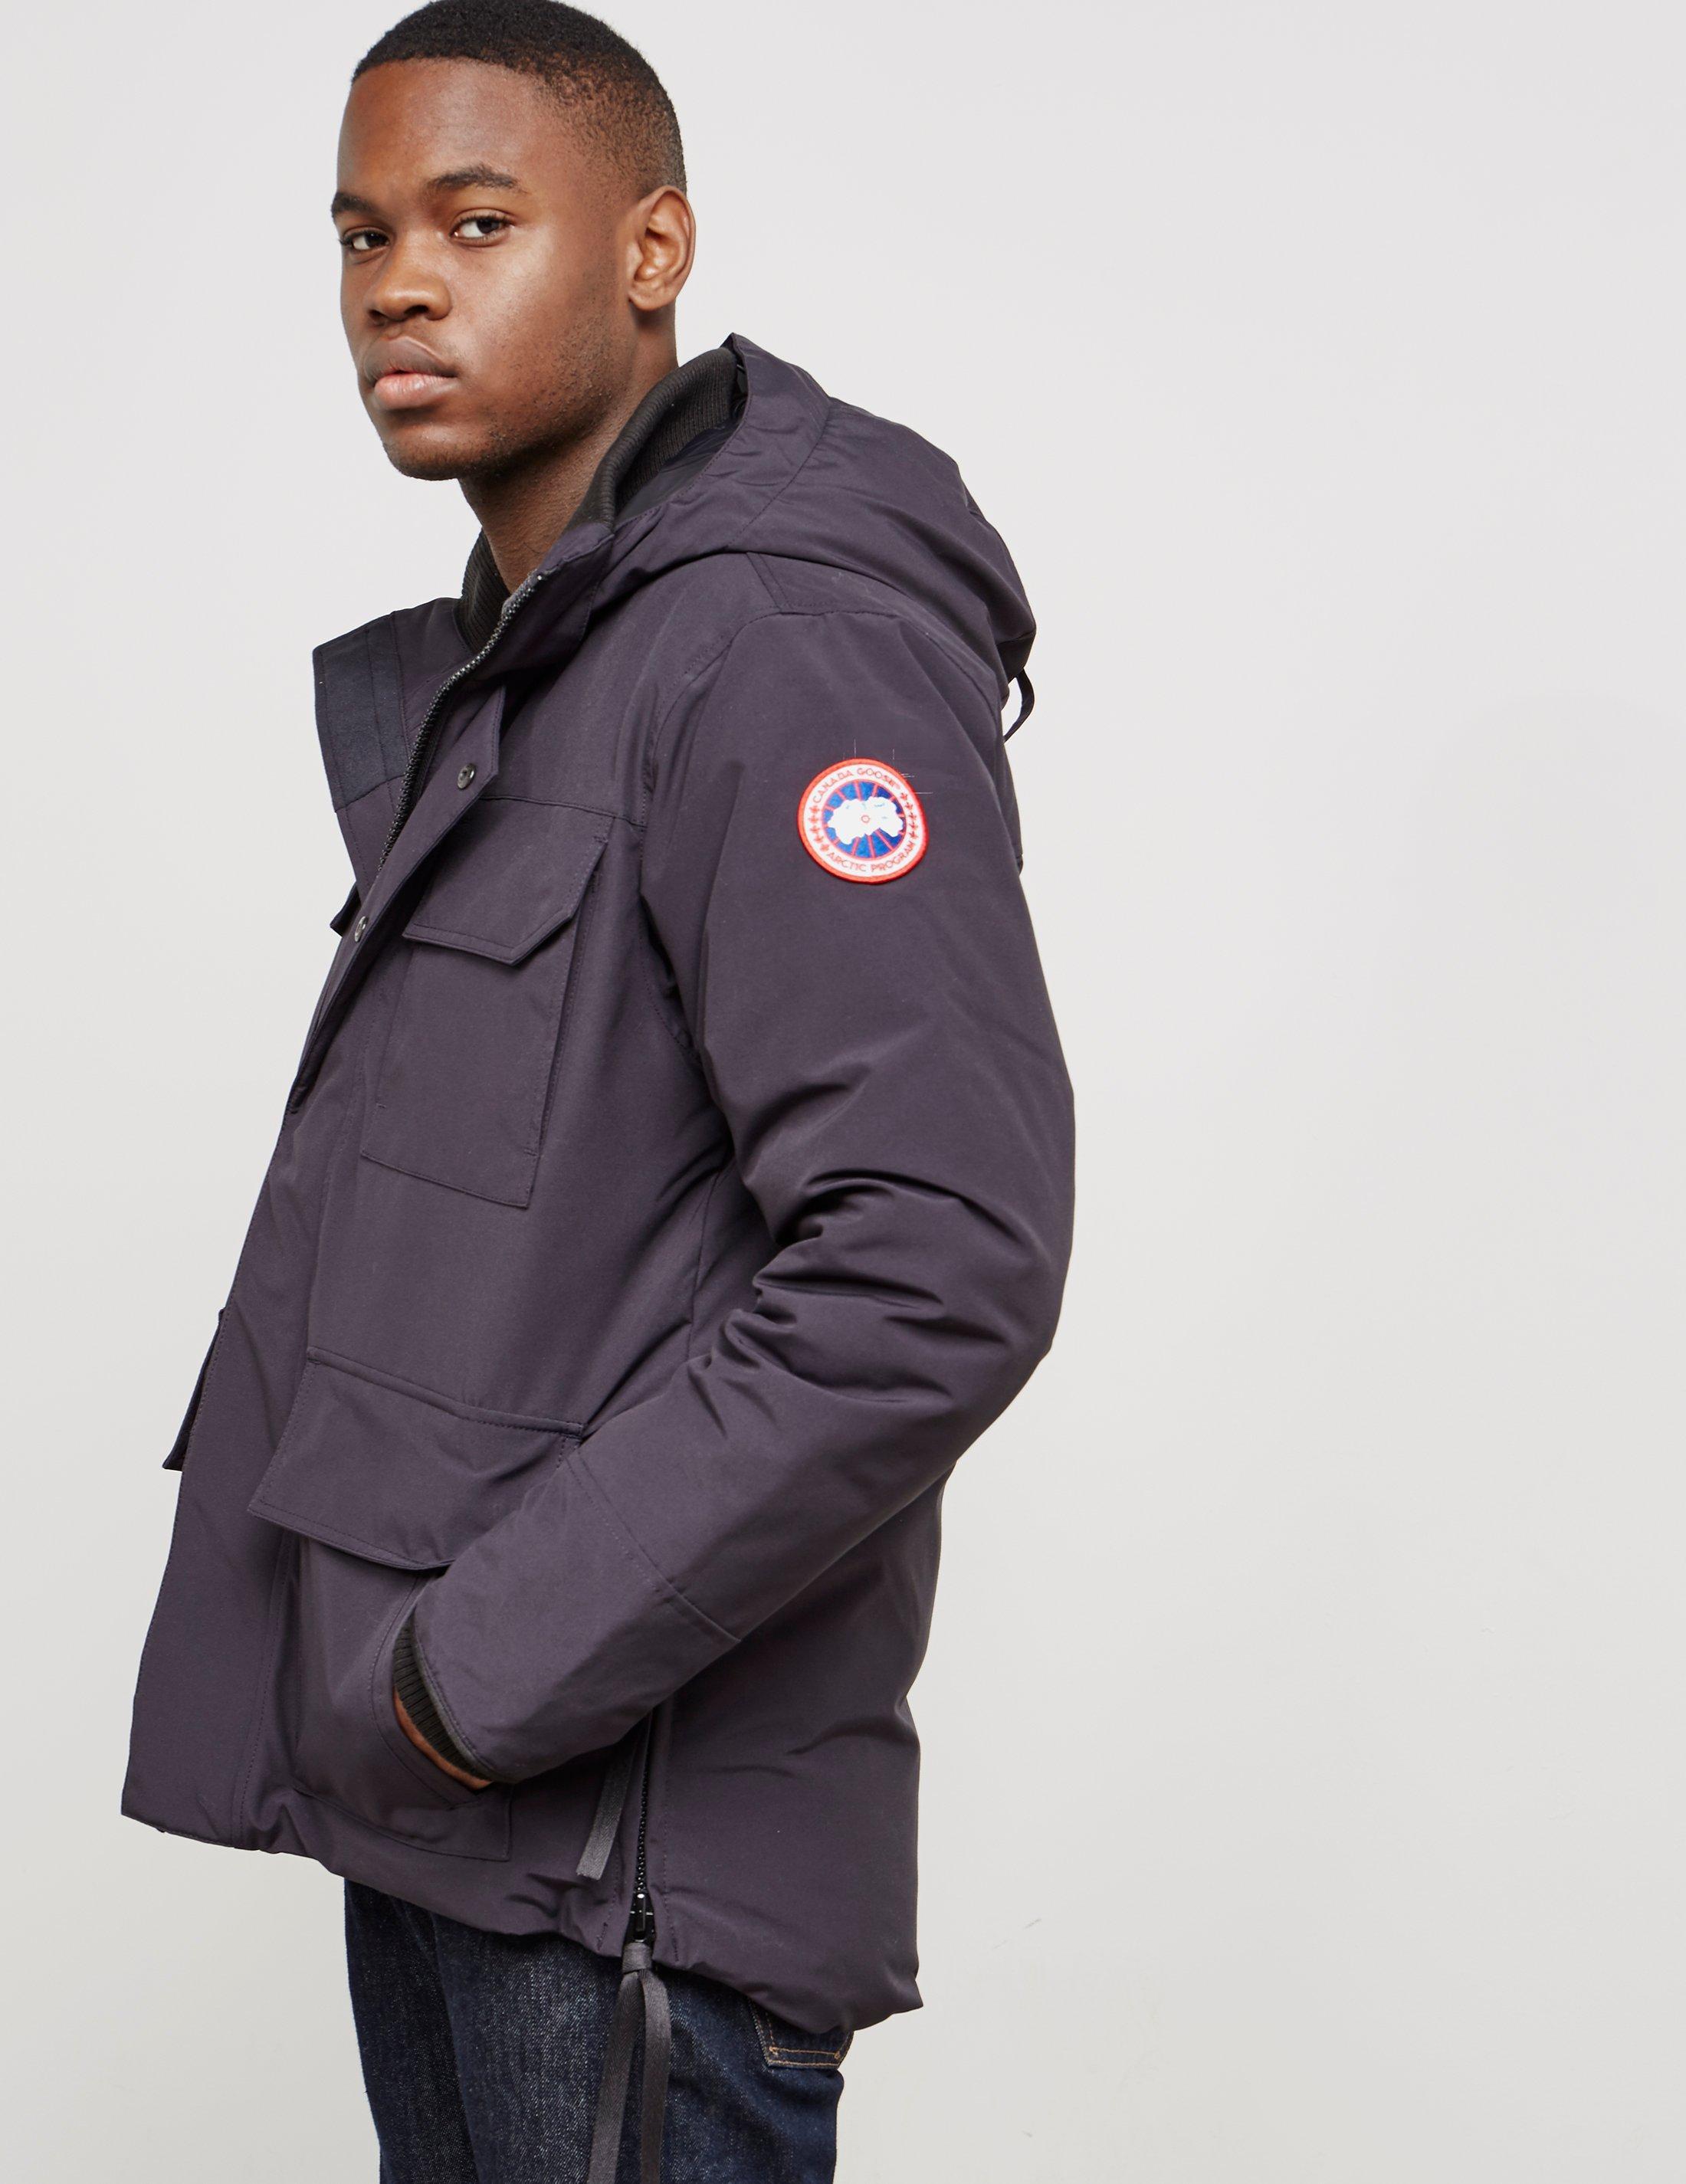 canada goose fall jacket men's